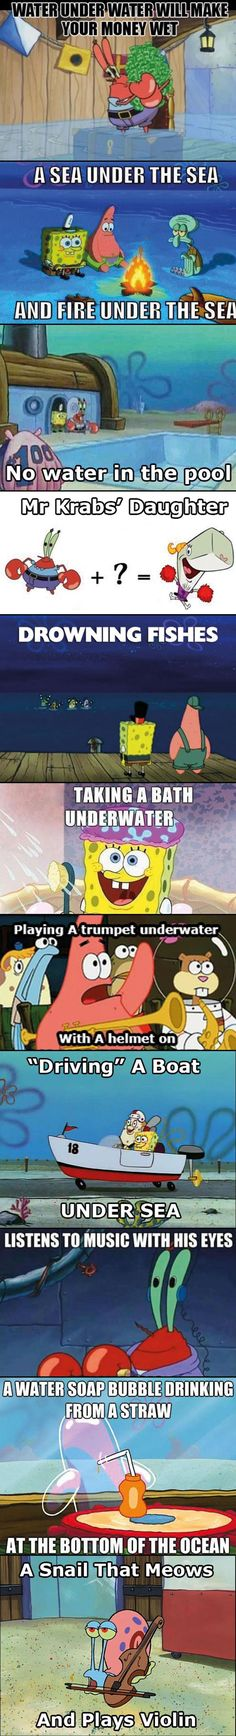 Spongebob logic #funny #lol #humor